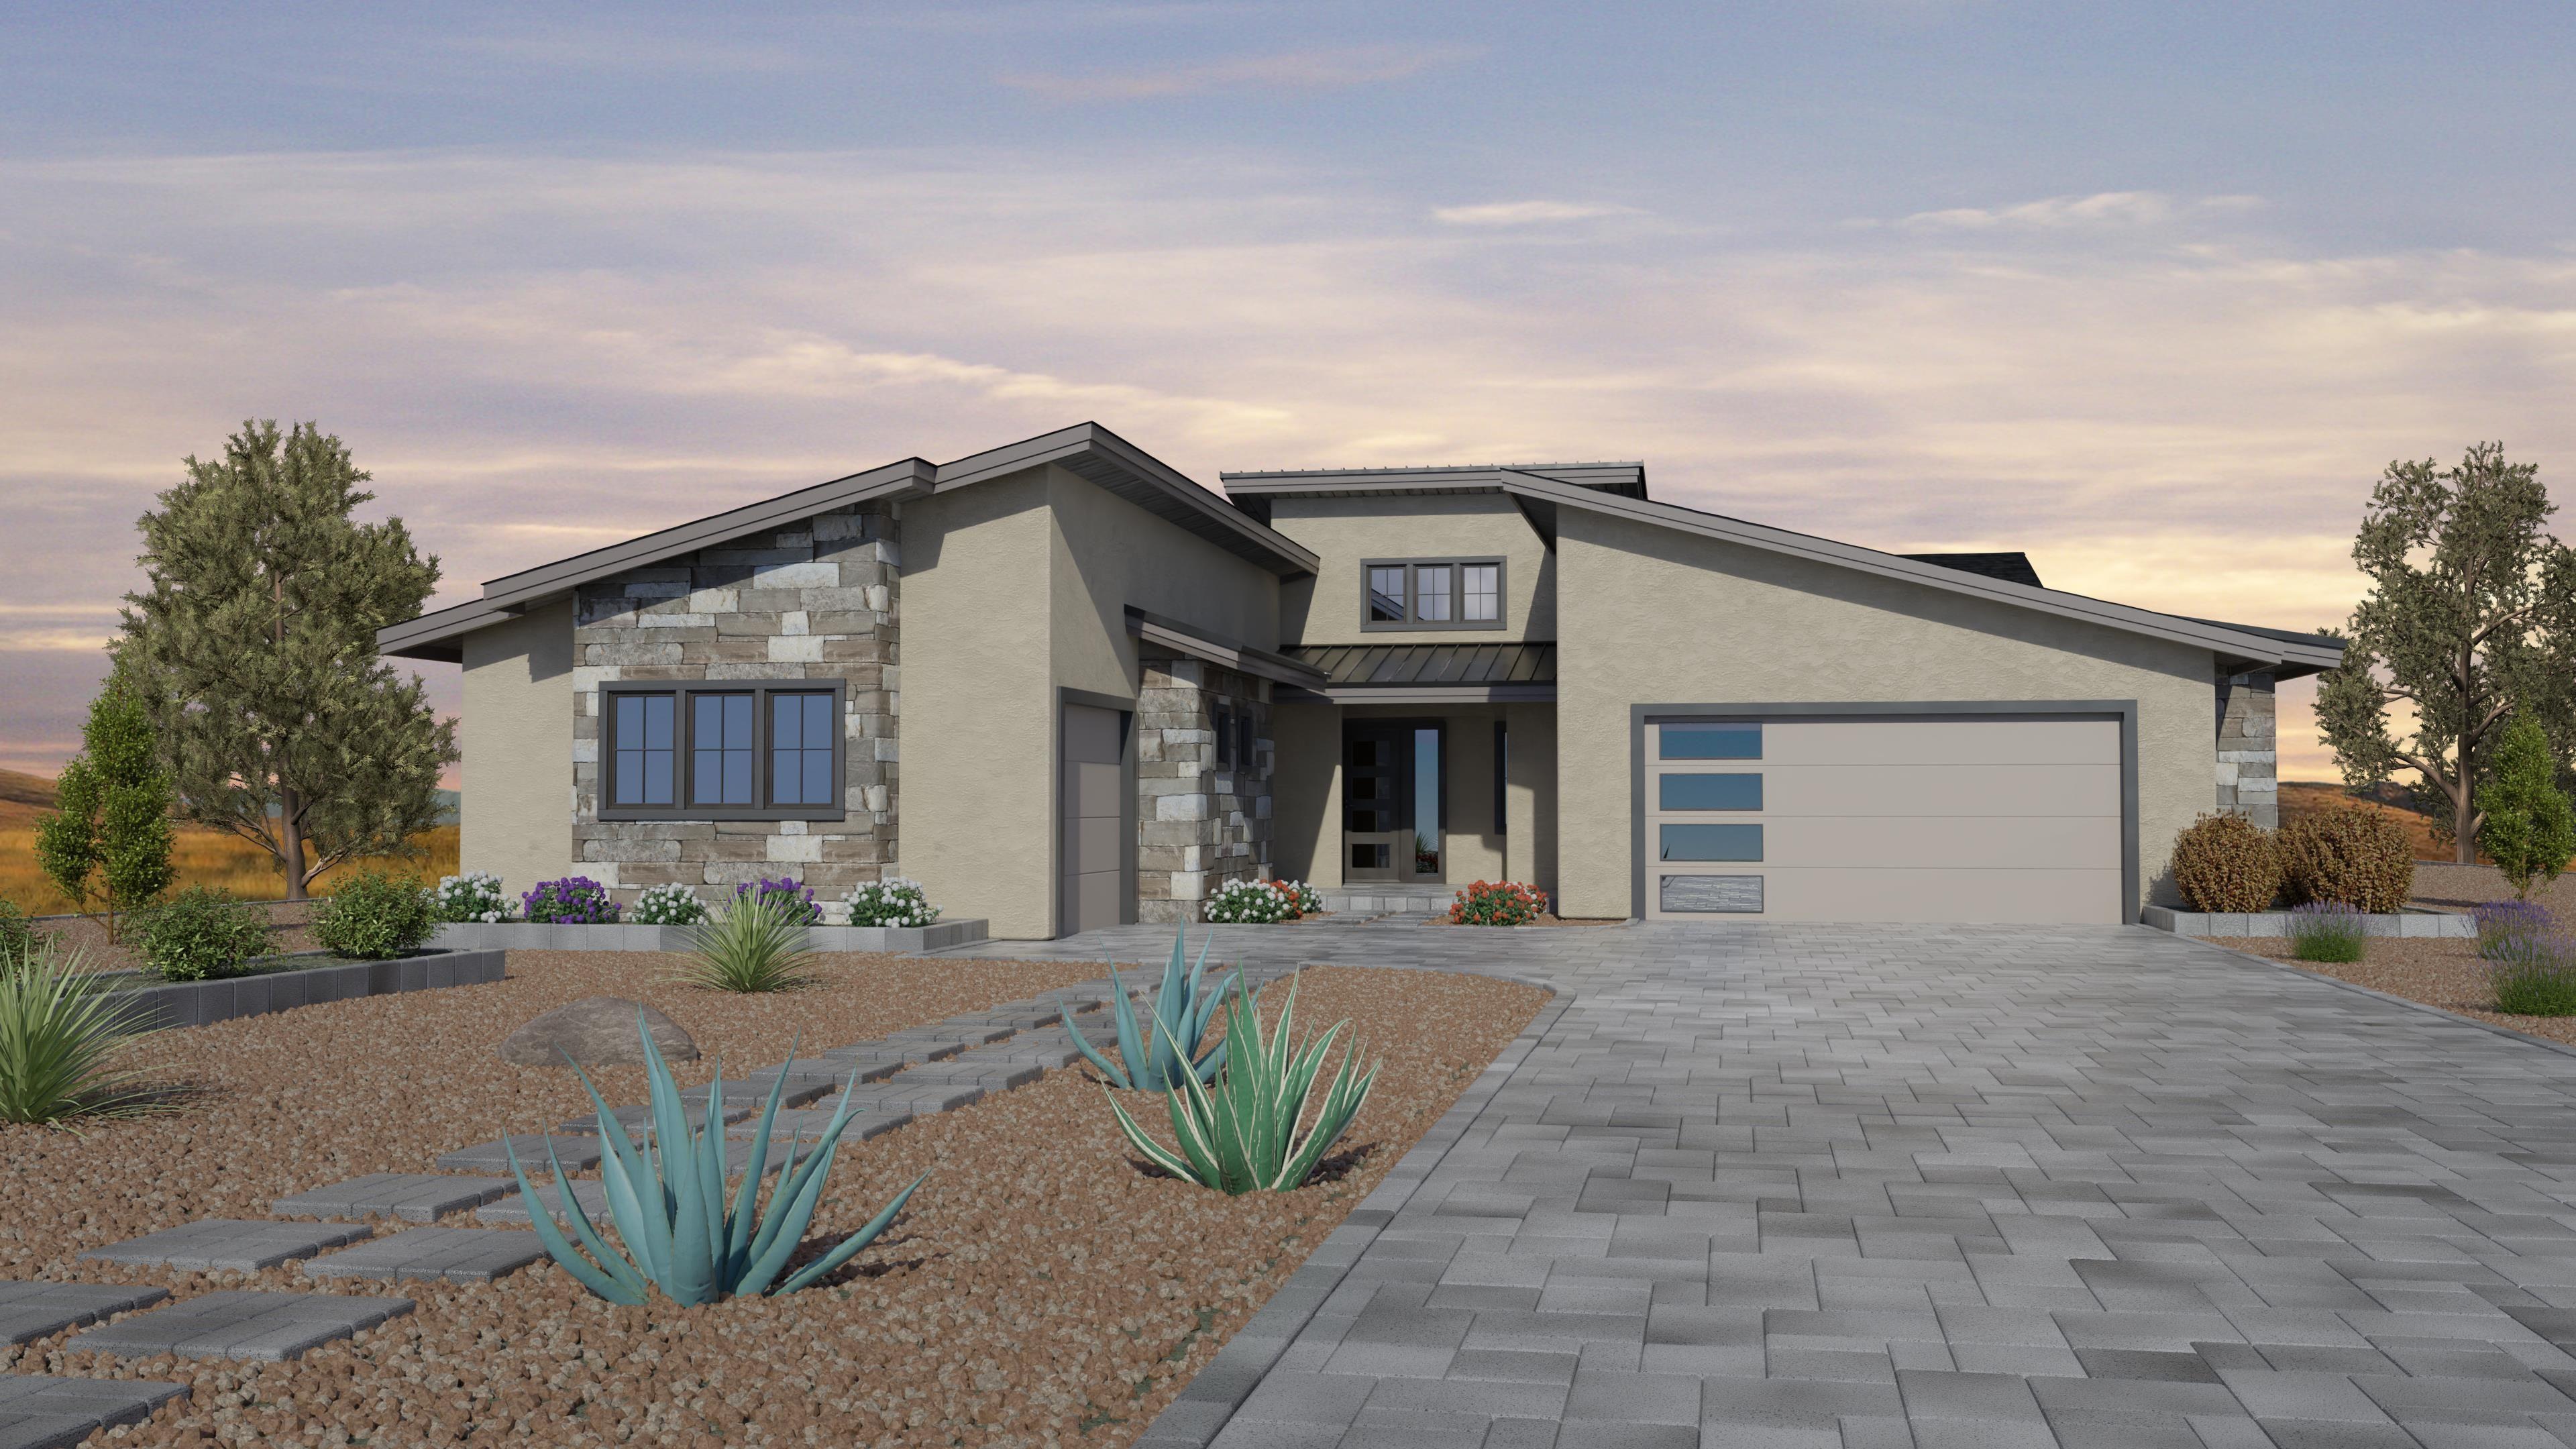 Exterior featured in the Jasper Featured Plan 2382 By Capstone Homes in Prescott, AZ